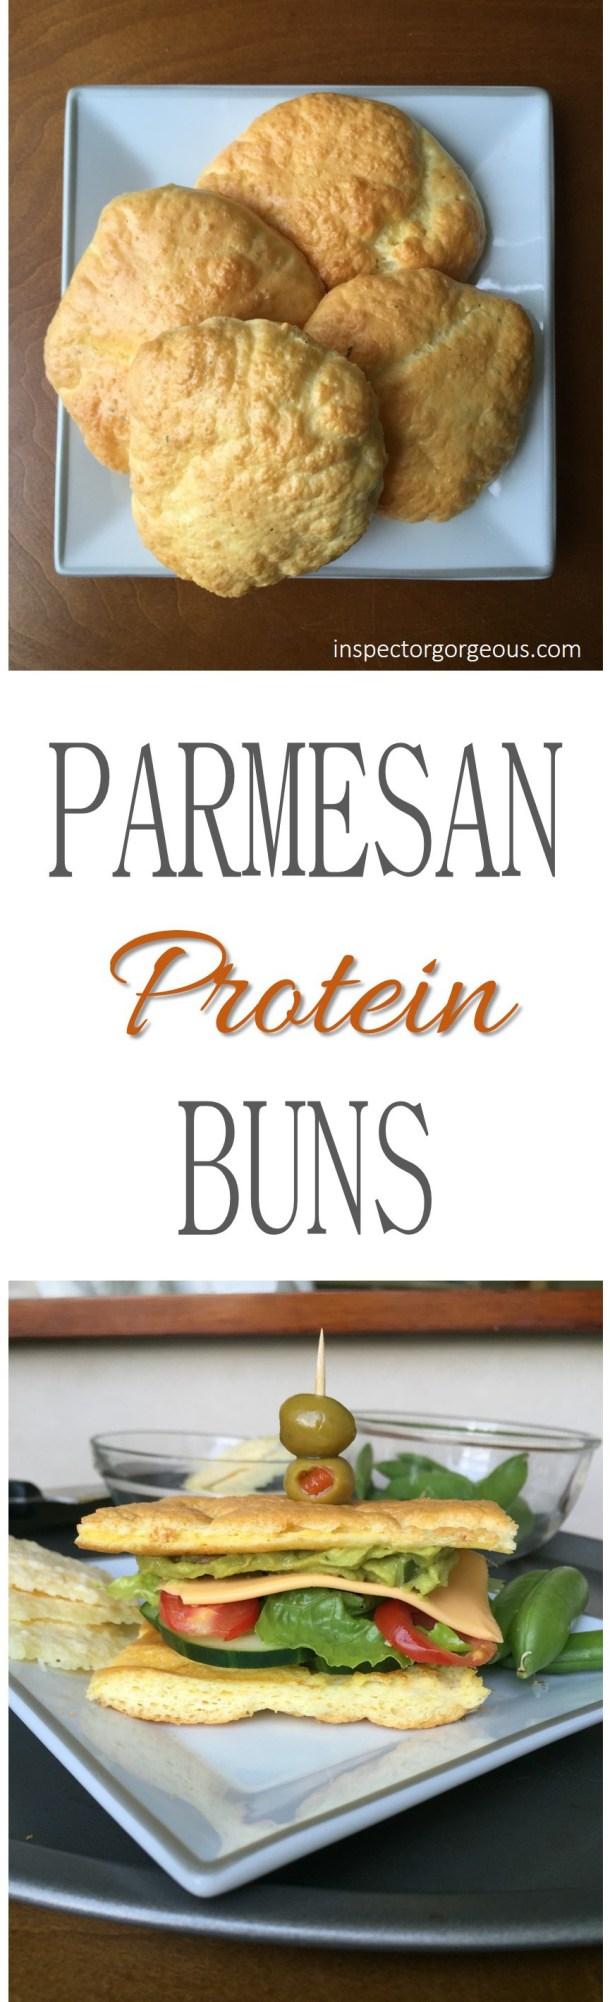 Parmesan Protein Buns